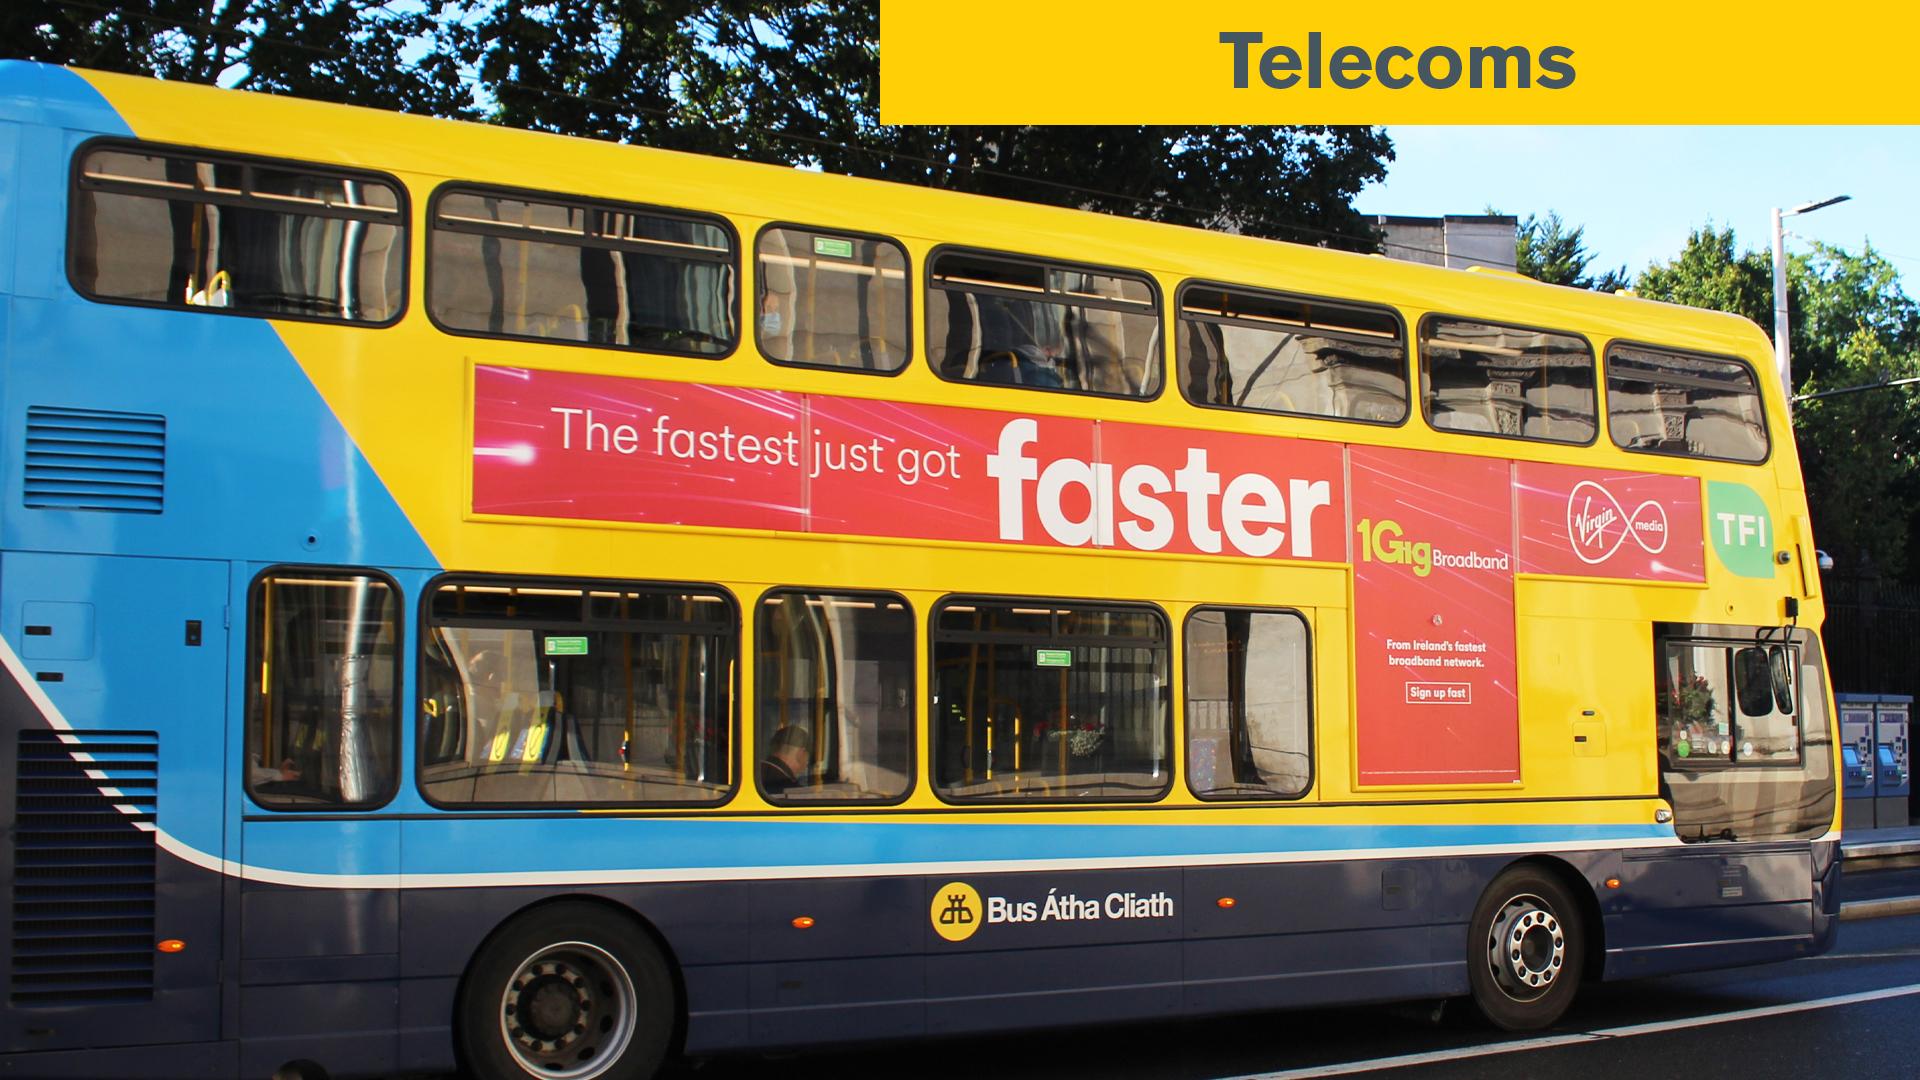 Poster Impact Awards Telecoms Winner